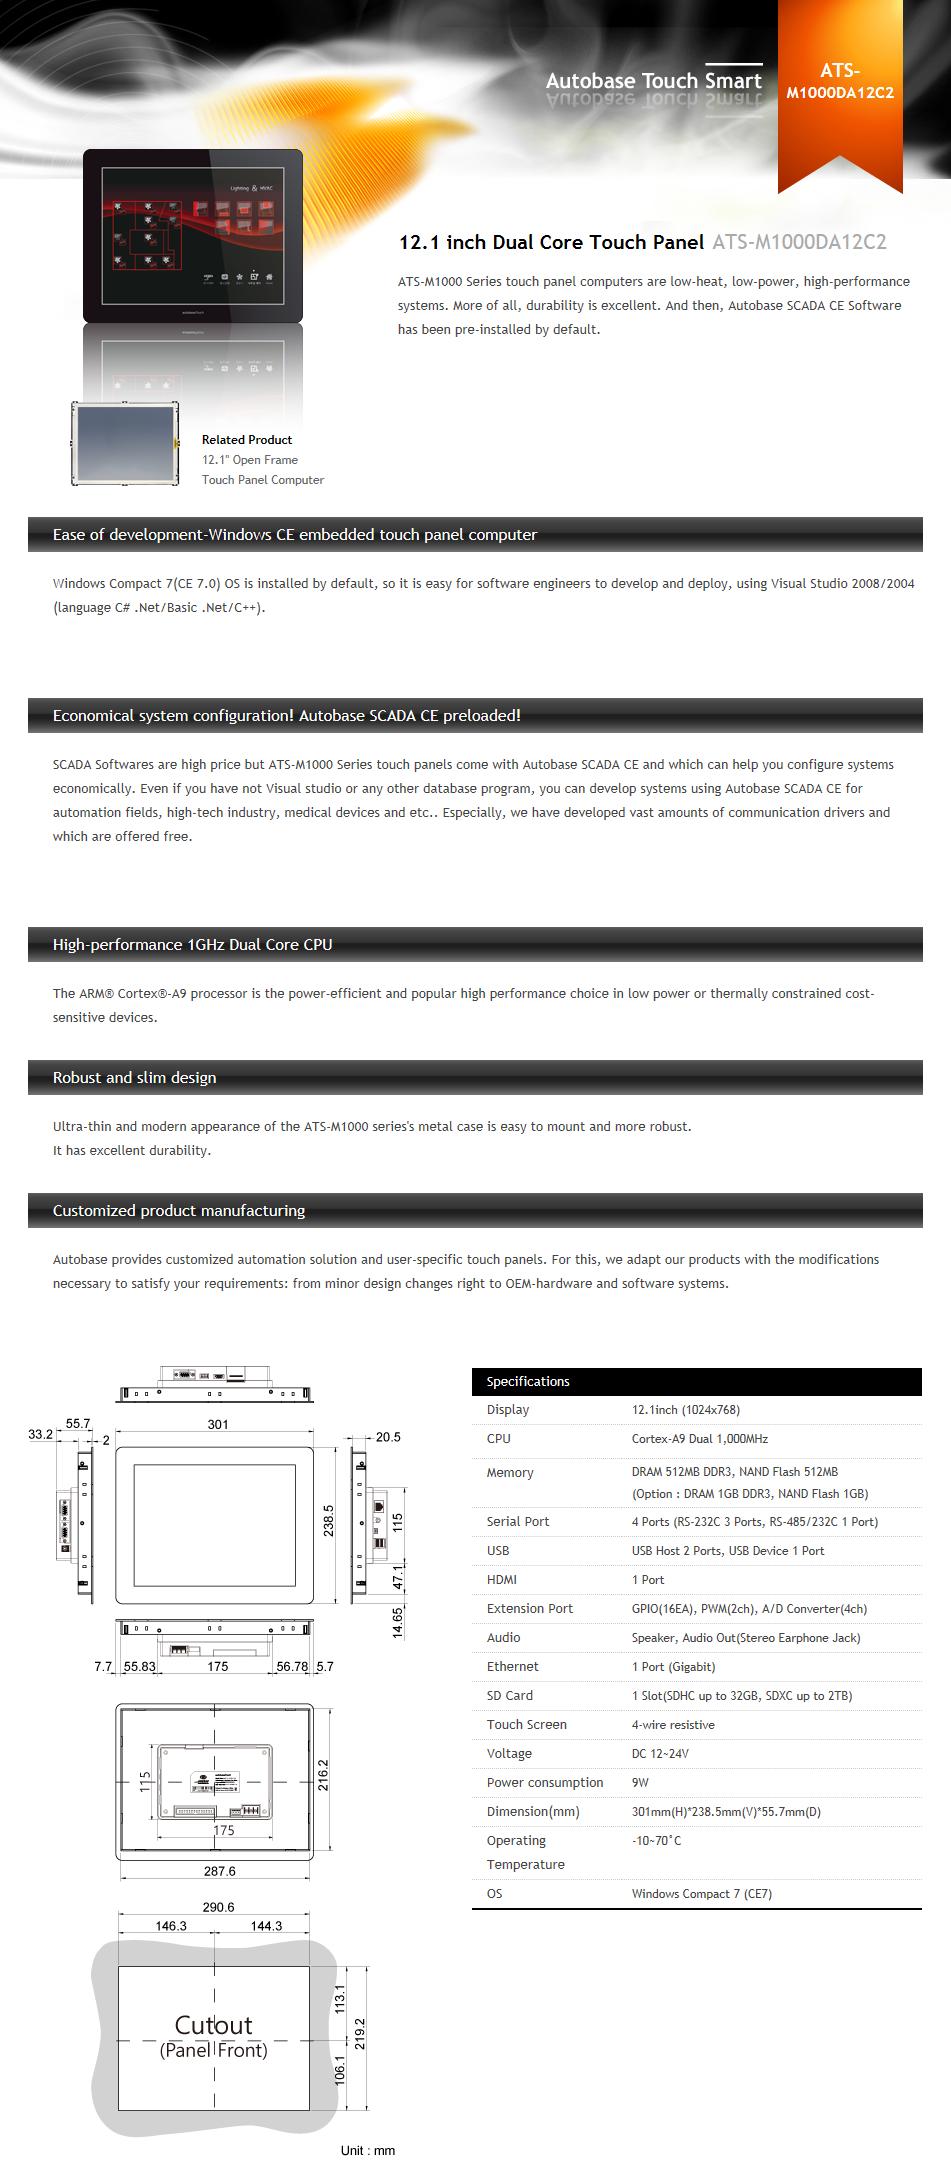 AUTOBASE 12.1 inch Dual Core Touch Panel ATS-M1000DA12C2